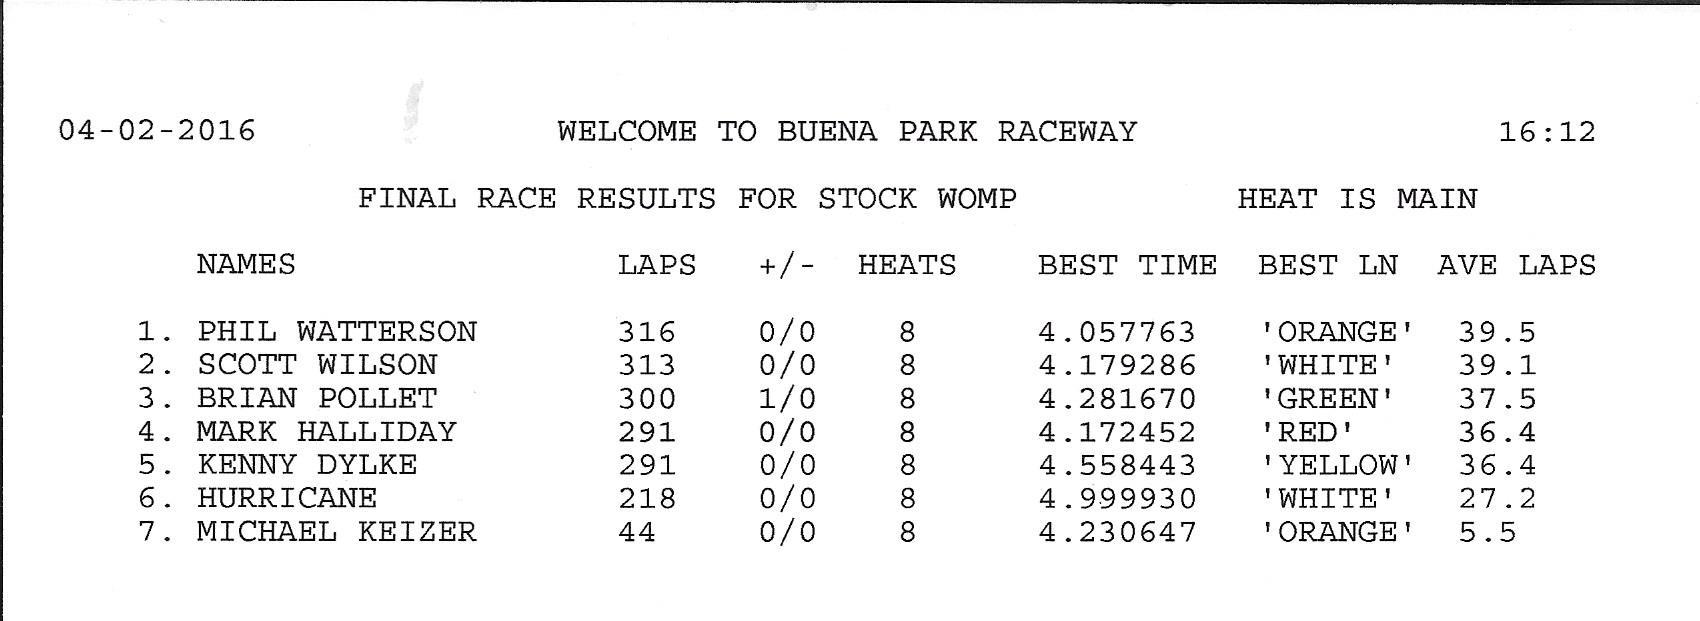 4216 womp results.jpg